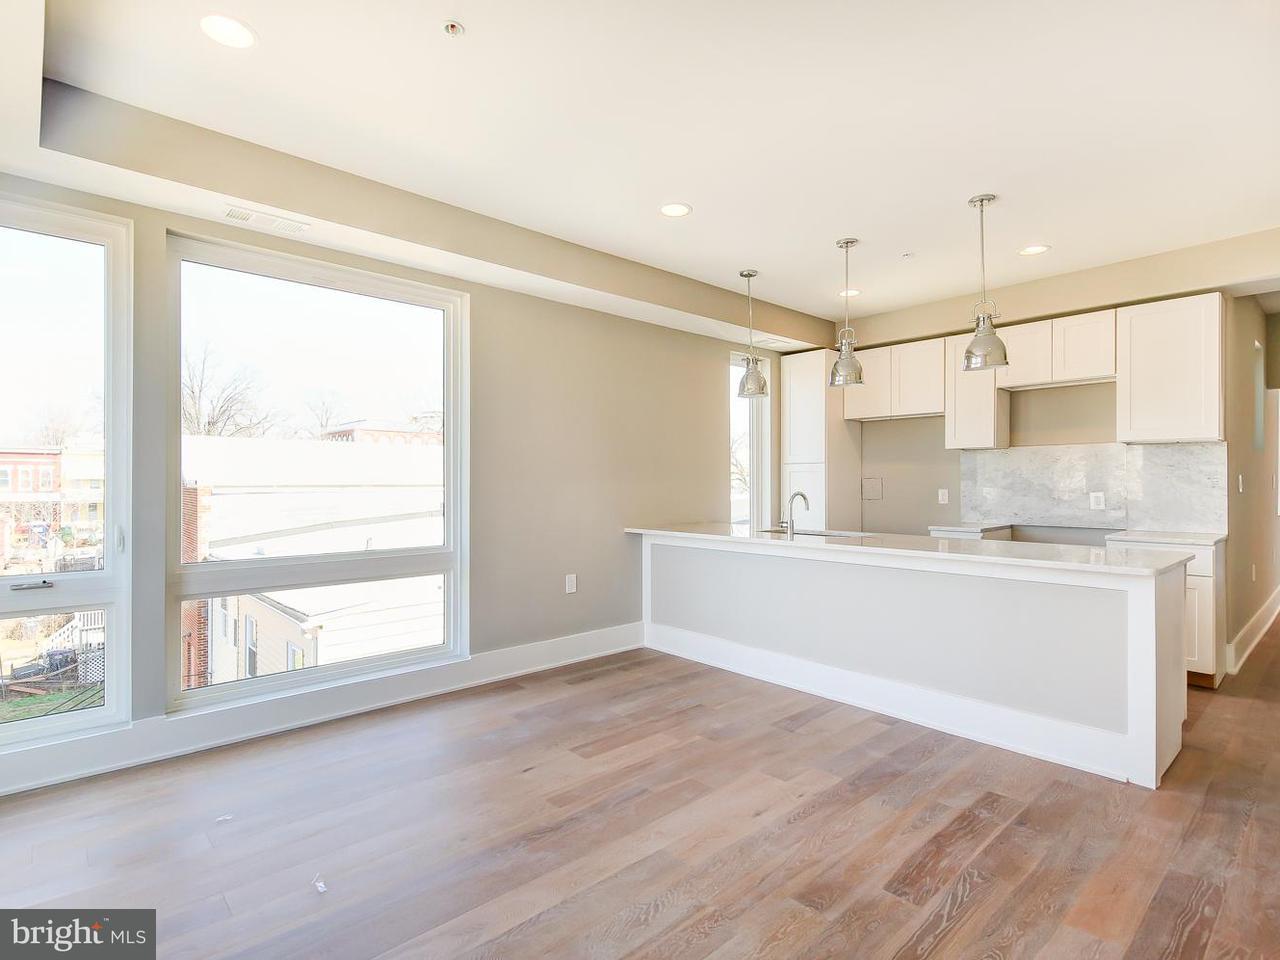 Condominium for Sale at 1112 Montello Ave Ne #302 1112 Montello Ave Ne #302 Washington, District Of Columbia 20002 United States